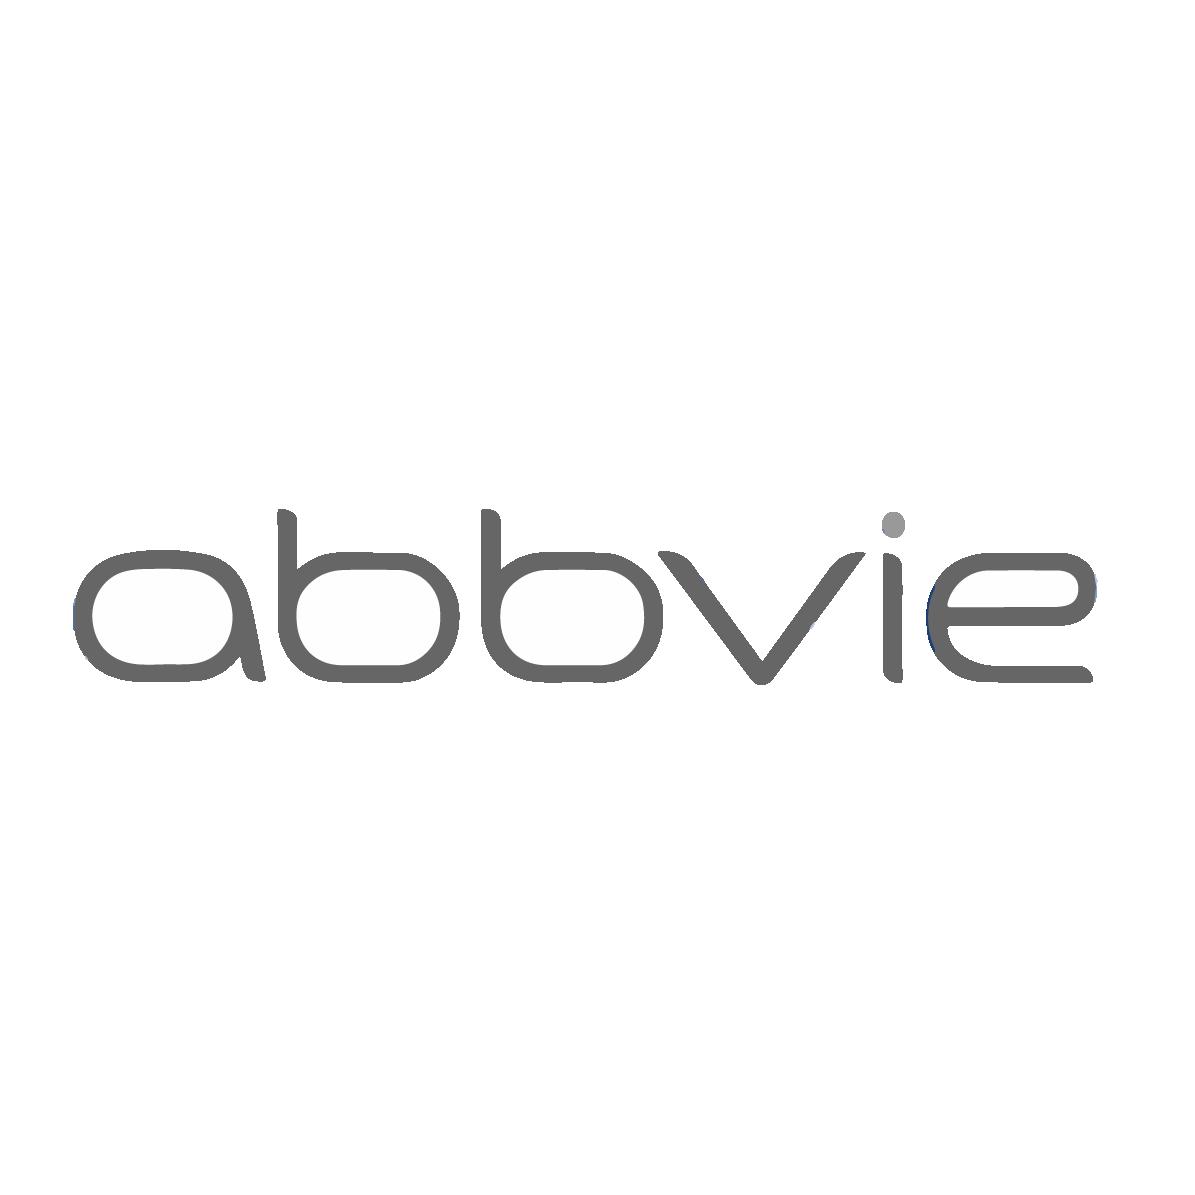 Abbvie-01.png